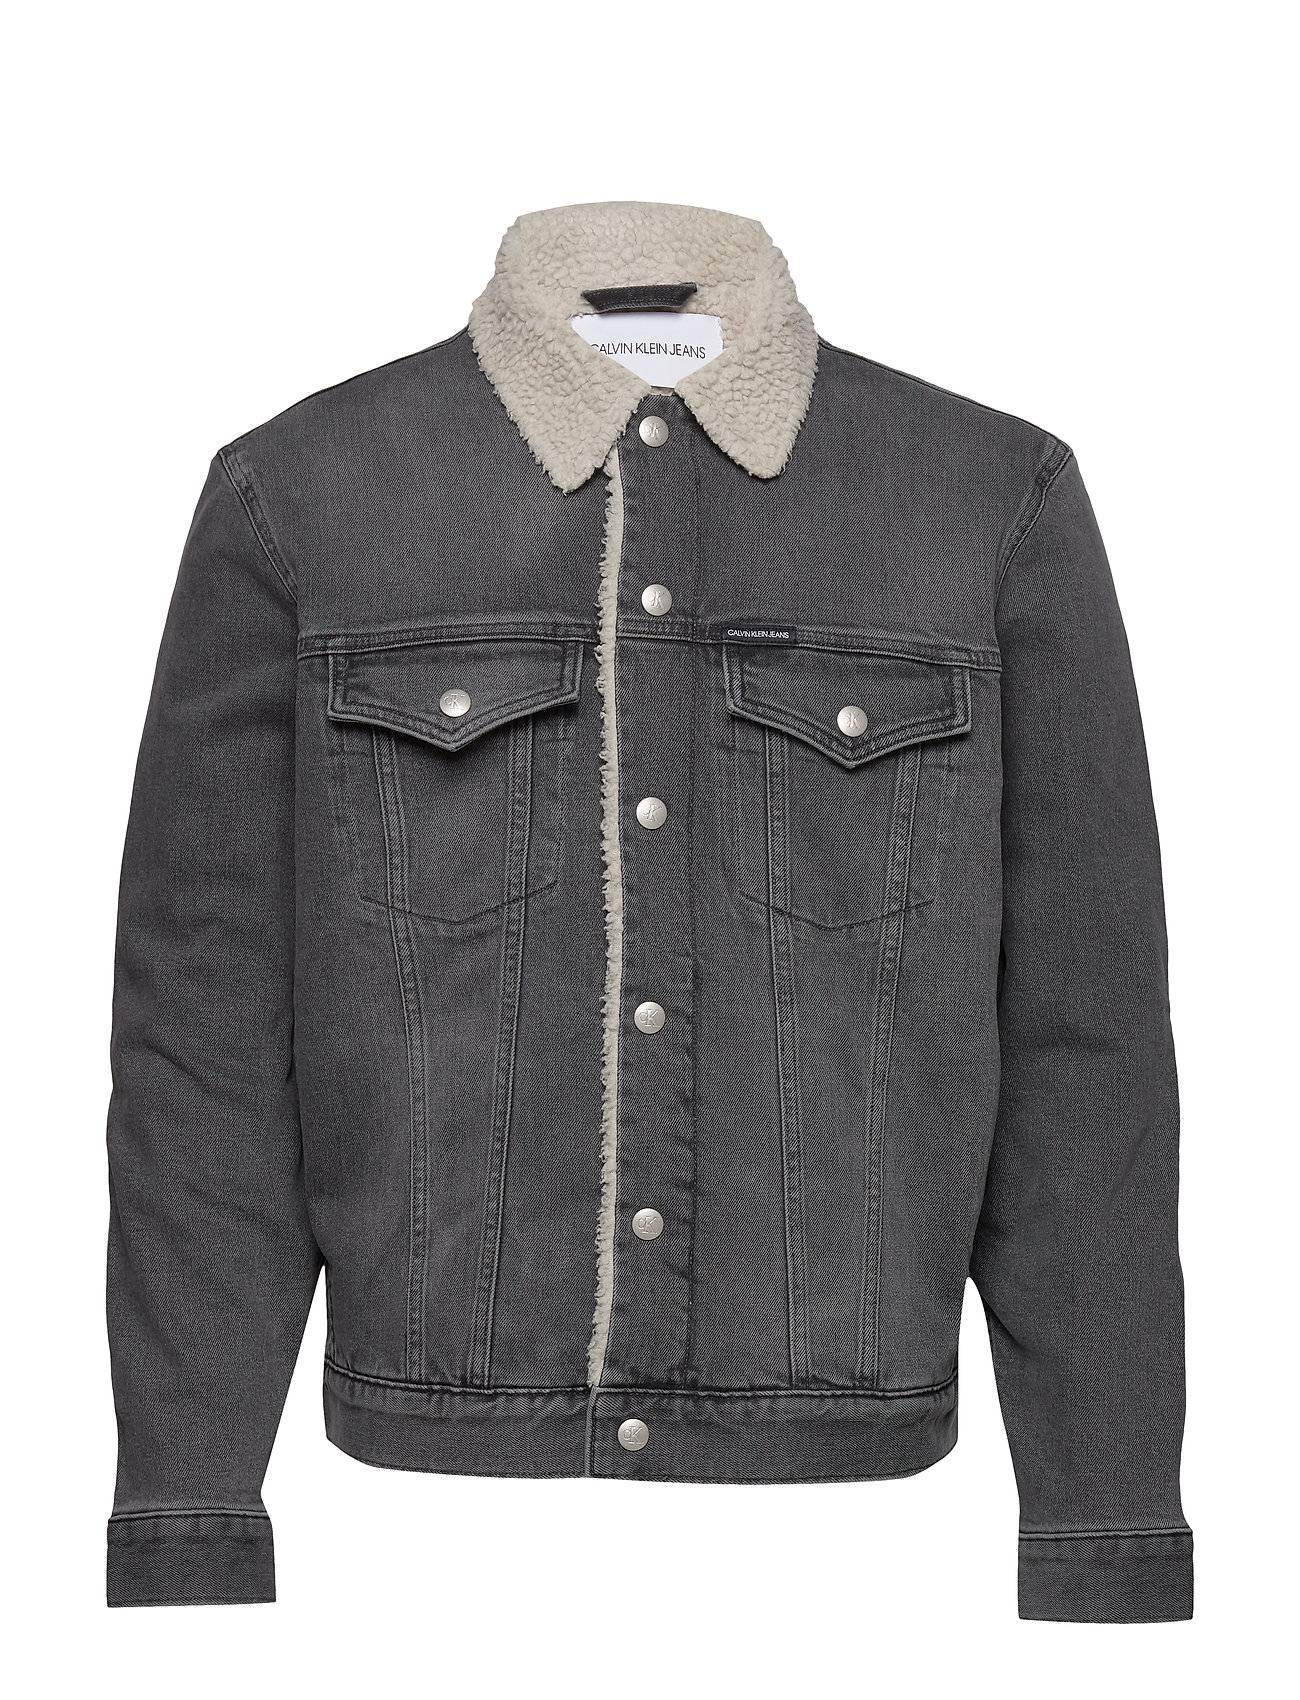 Image of Calvin Sherpa Foundation Denim Jacket Farkkutakki Denimtakki Harmaa Calvin Klein Jeans